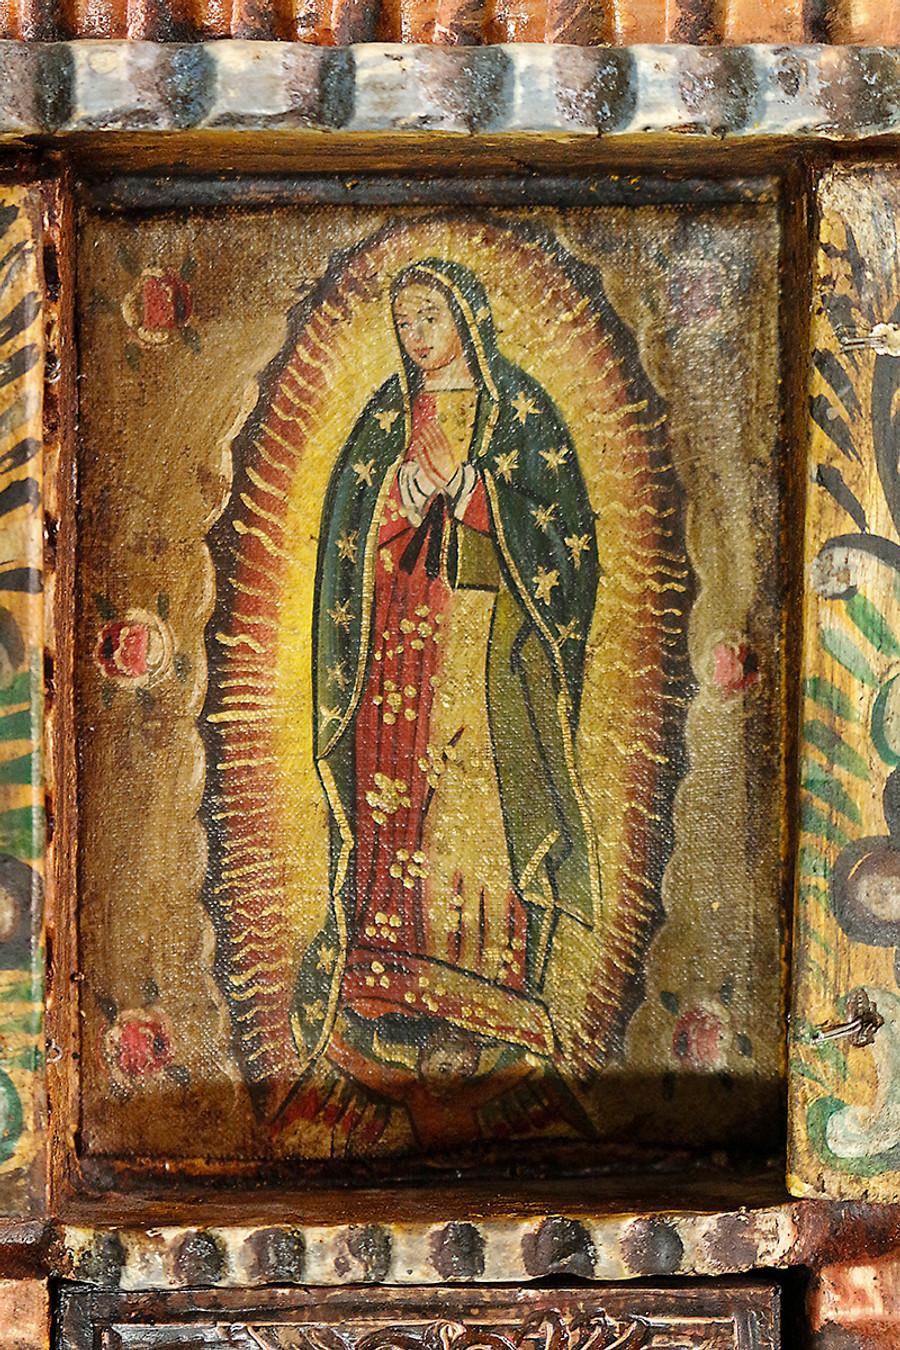 Guadalupe Virgin Colonial Peru Art Handmade Retablo Handcarved Altarpiece (4574)